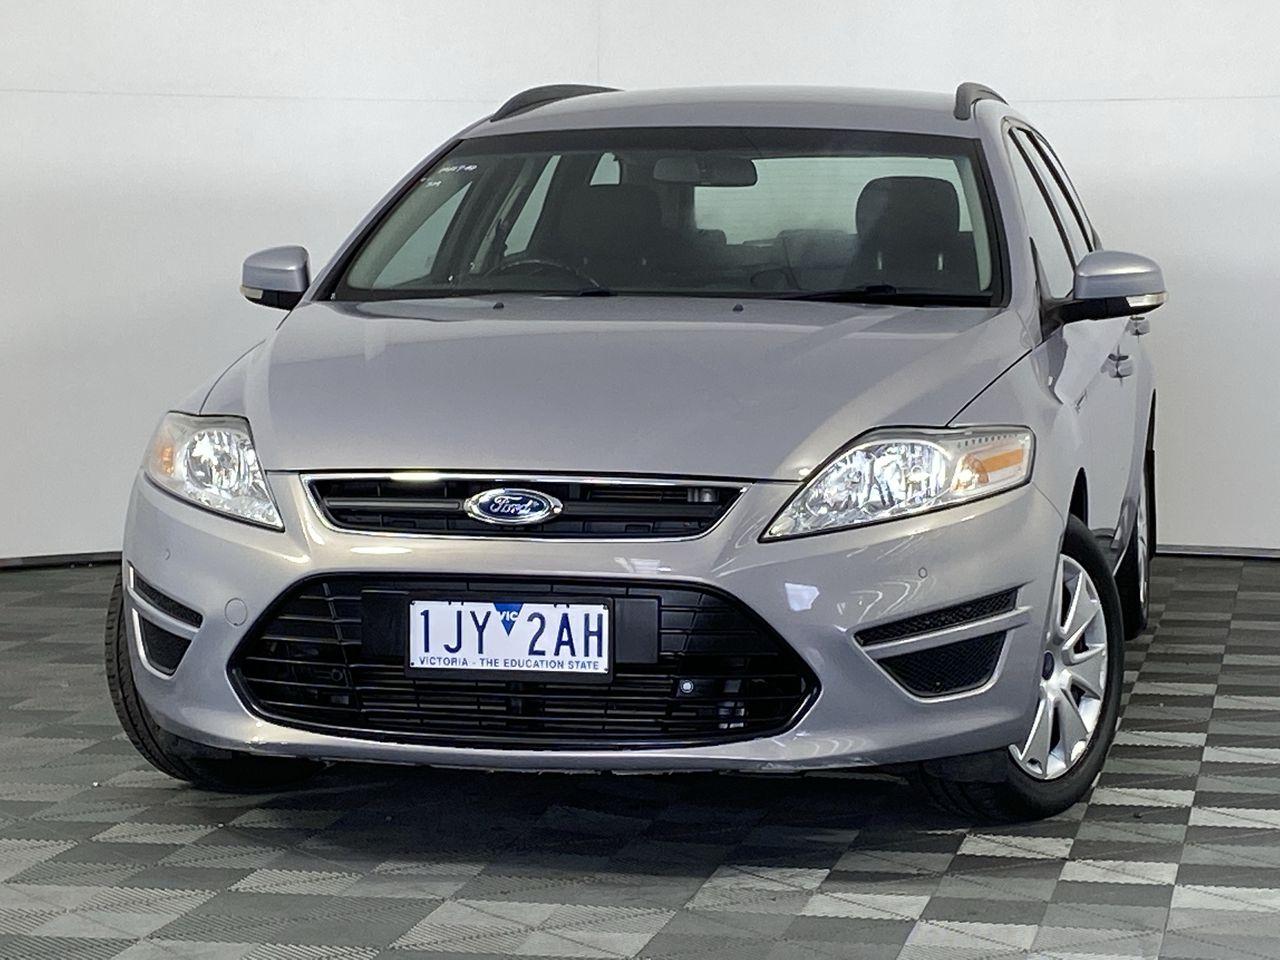 2013 Ford Mondeo LX Automatic Sedan